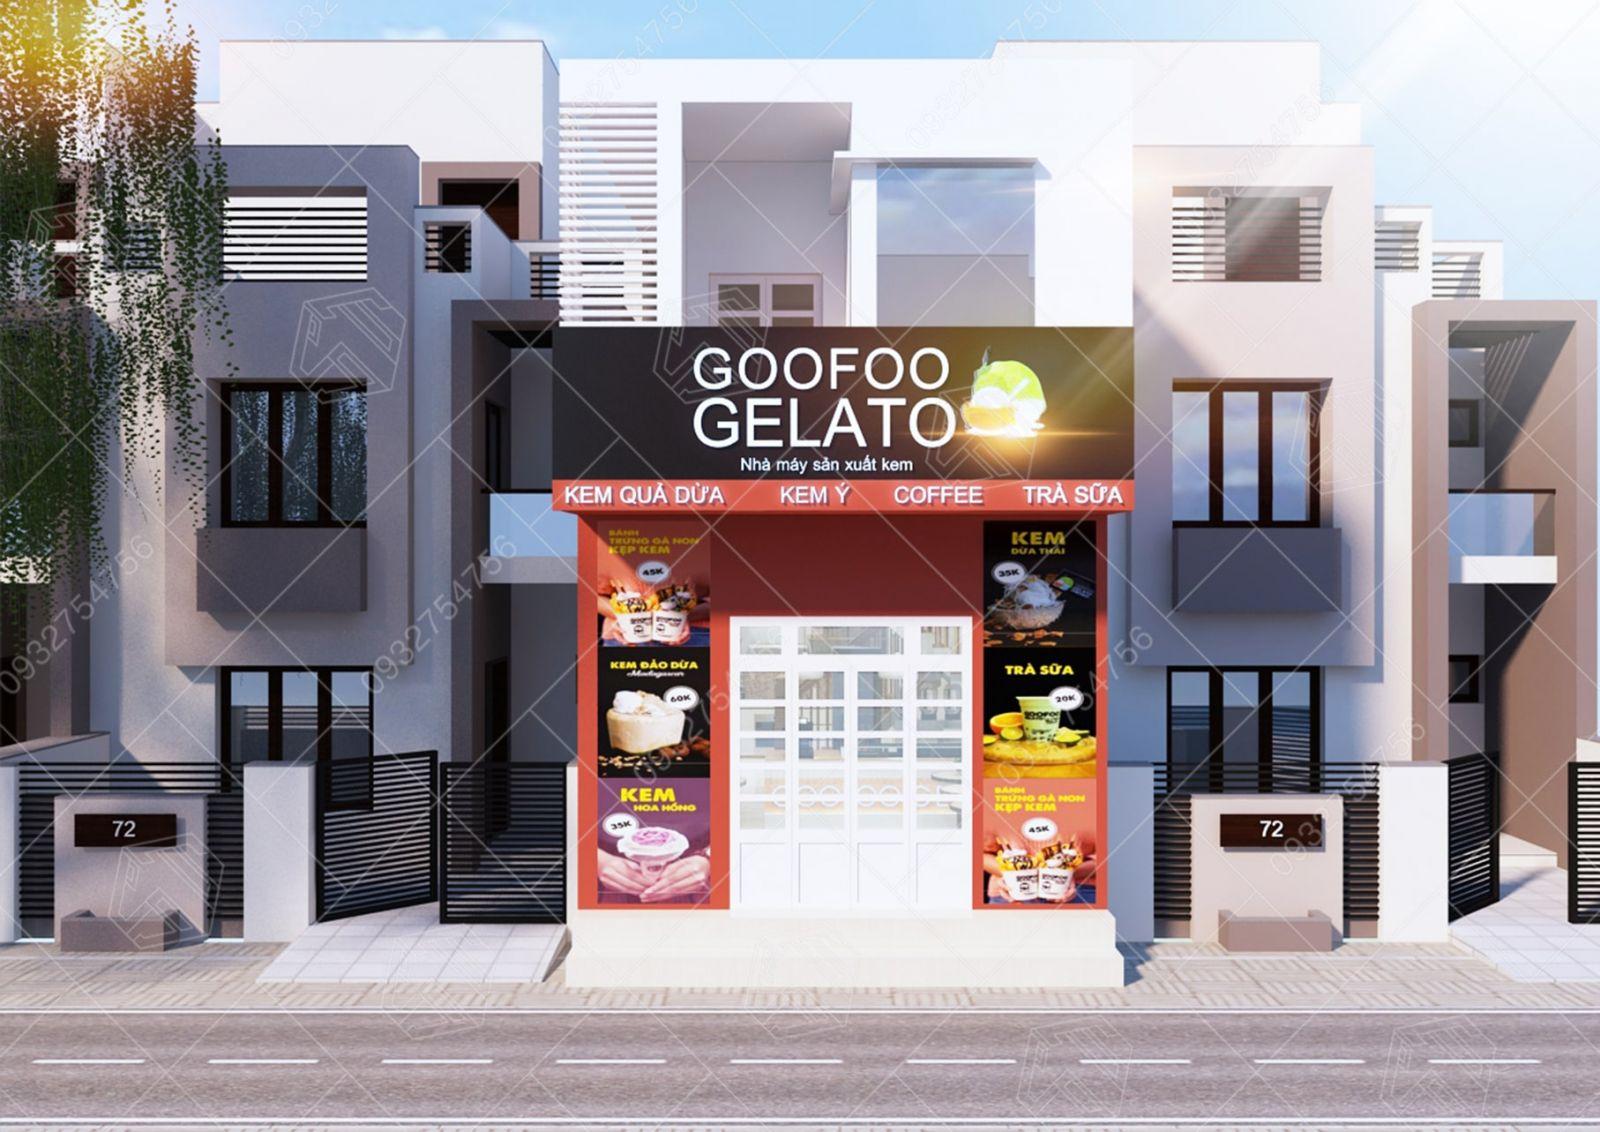 quán Goofoo Gelator huế